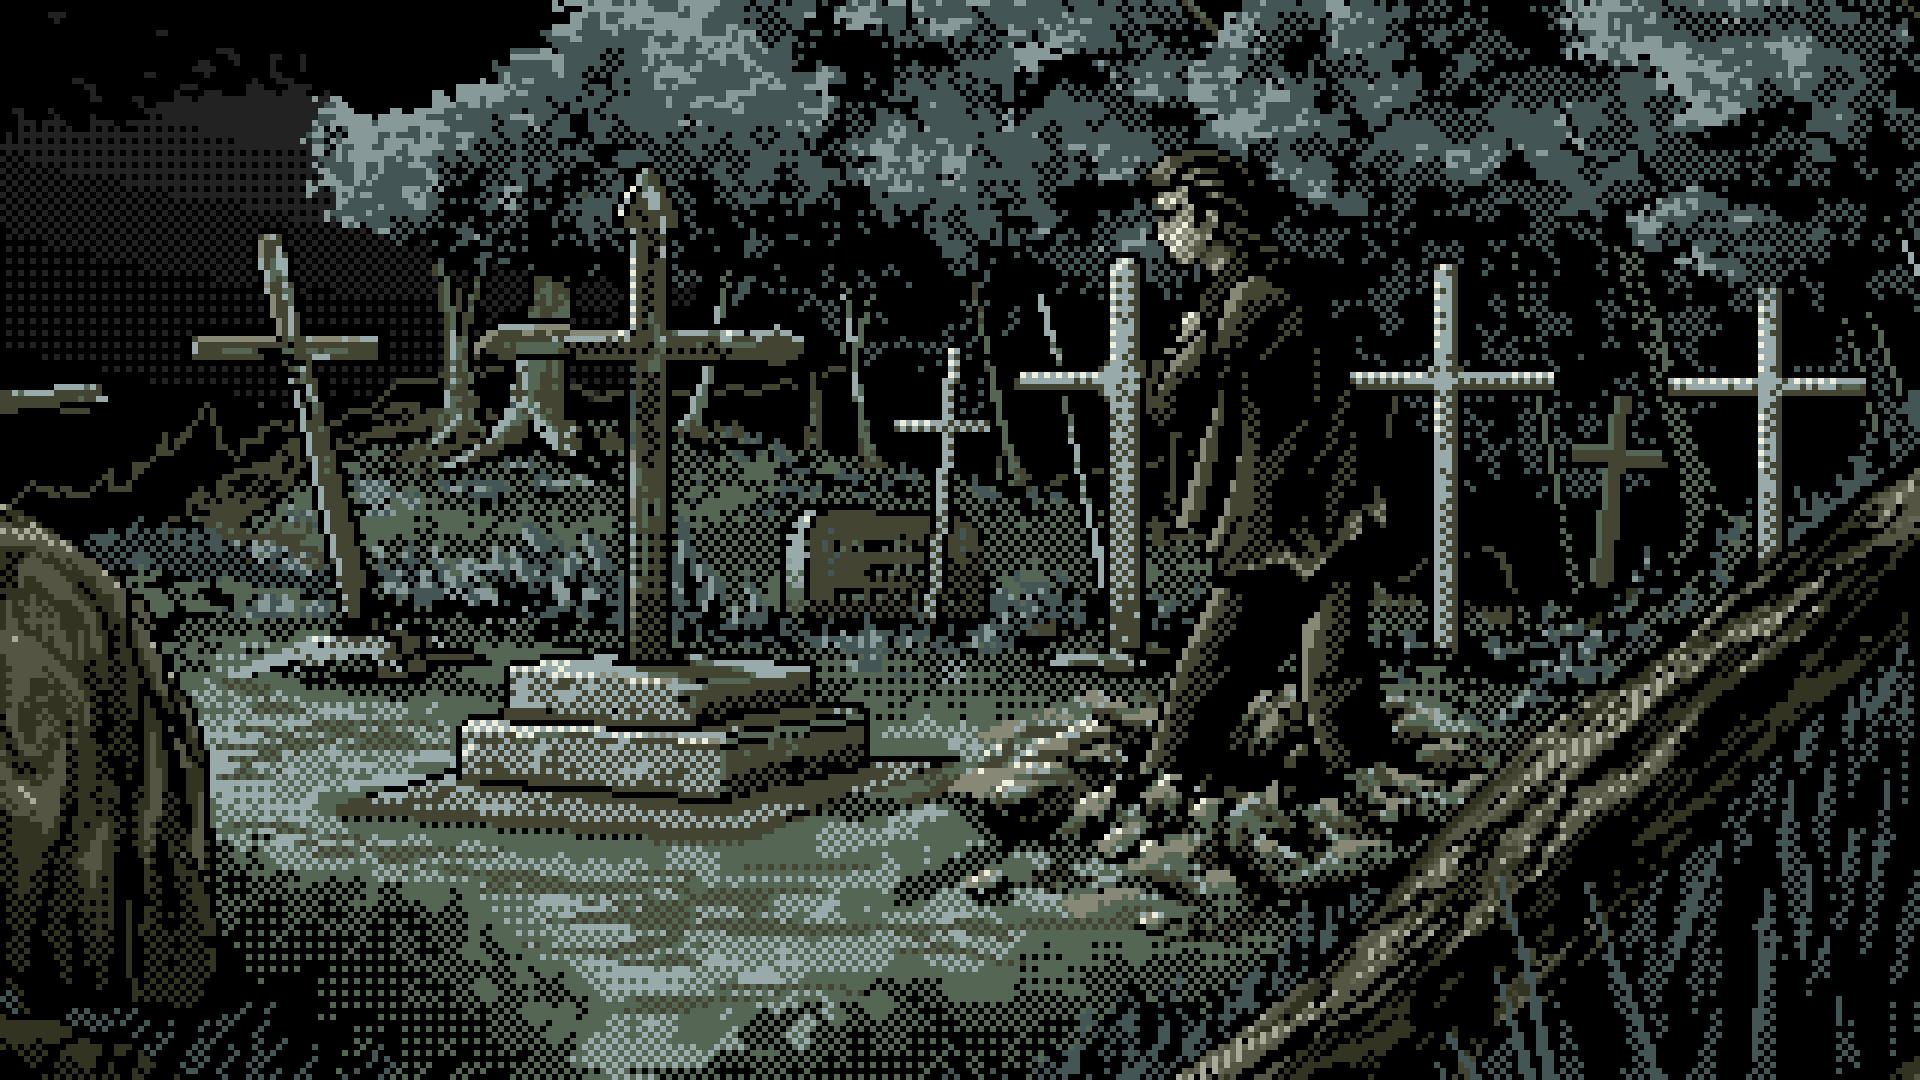 General 1920x1080 digital art pixel art pixelated pixels cross cemetery trees zombies grave night undead artwork spooky graveyards